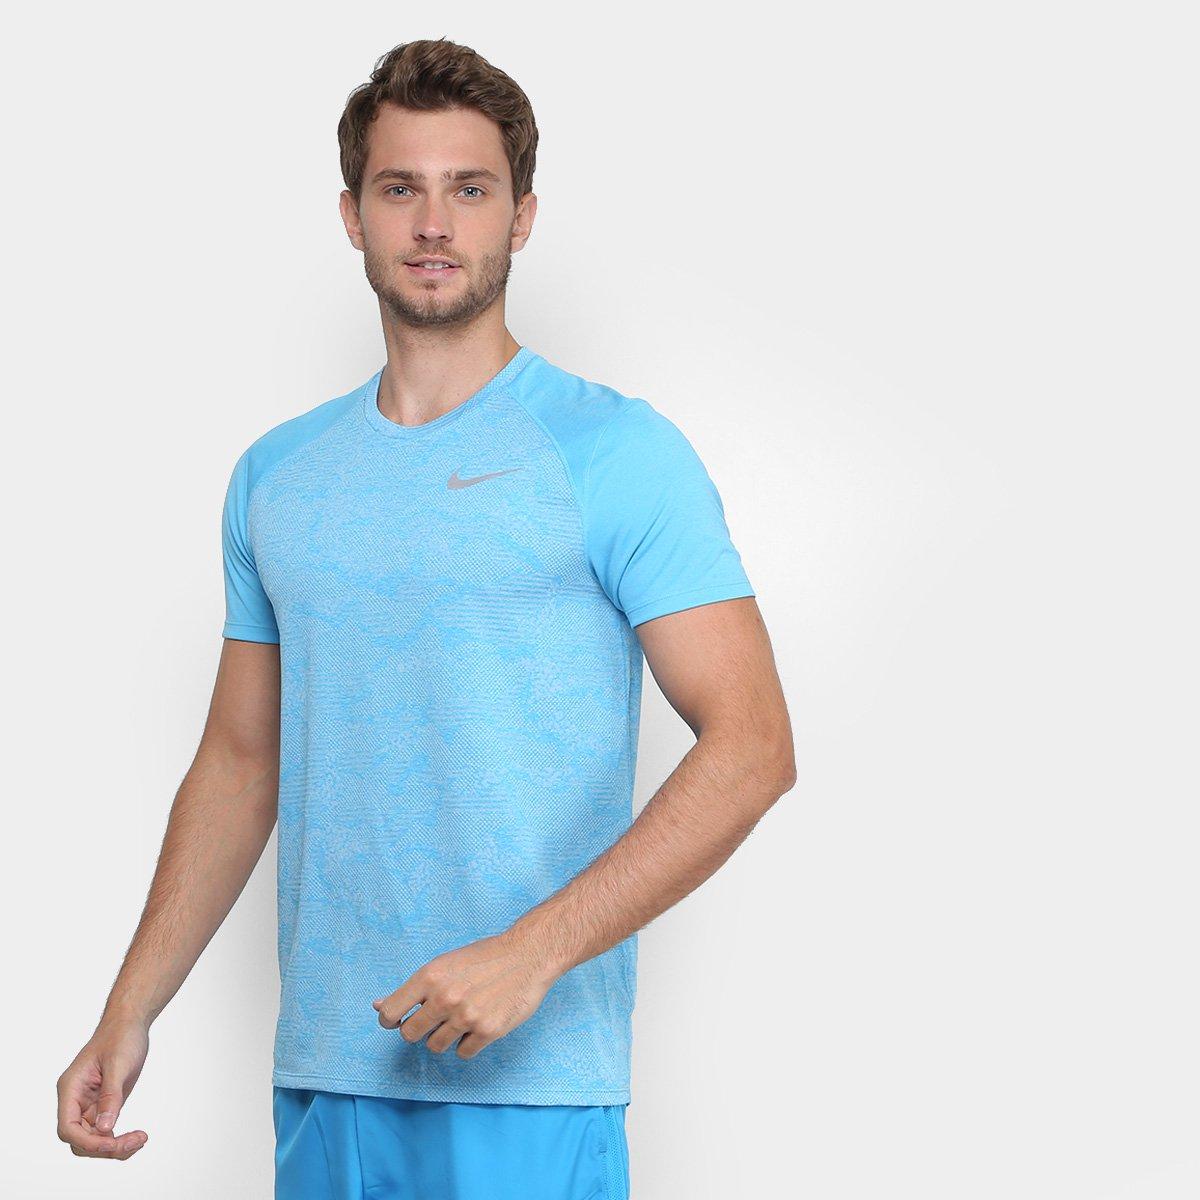 Camiseta Nike Breathe Miler Ss Nv Masculina - Compre Agora  29aa724bf1a9f